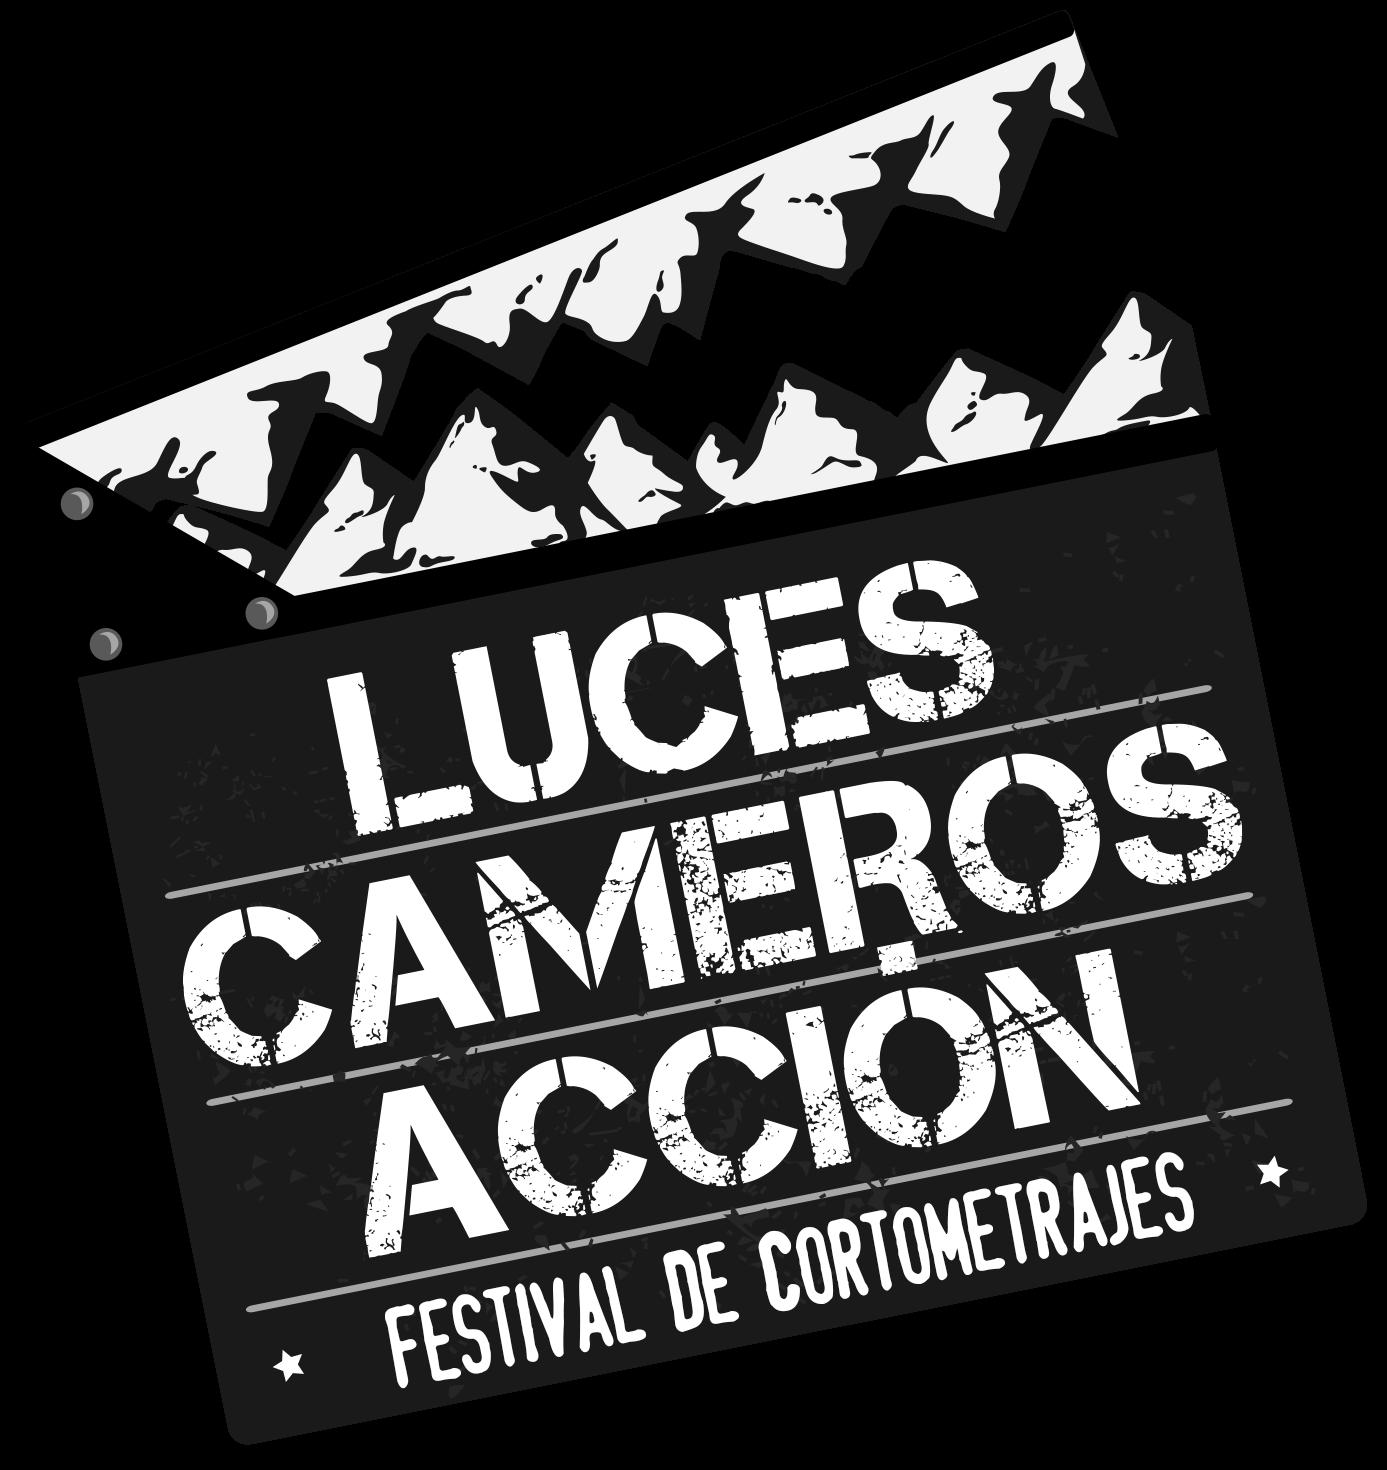 LUCES CAMEROS ACCION